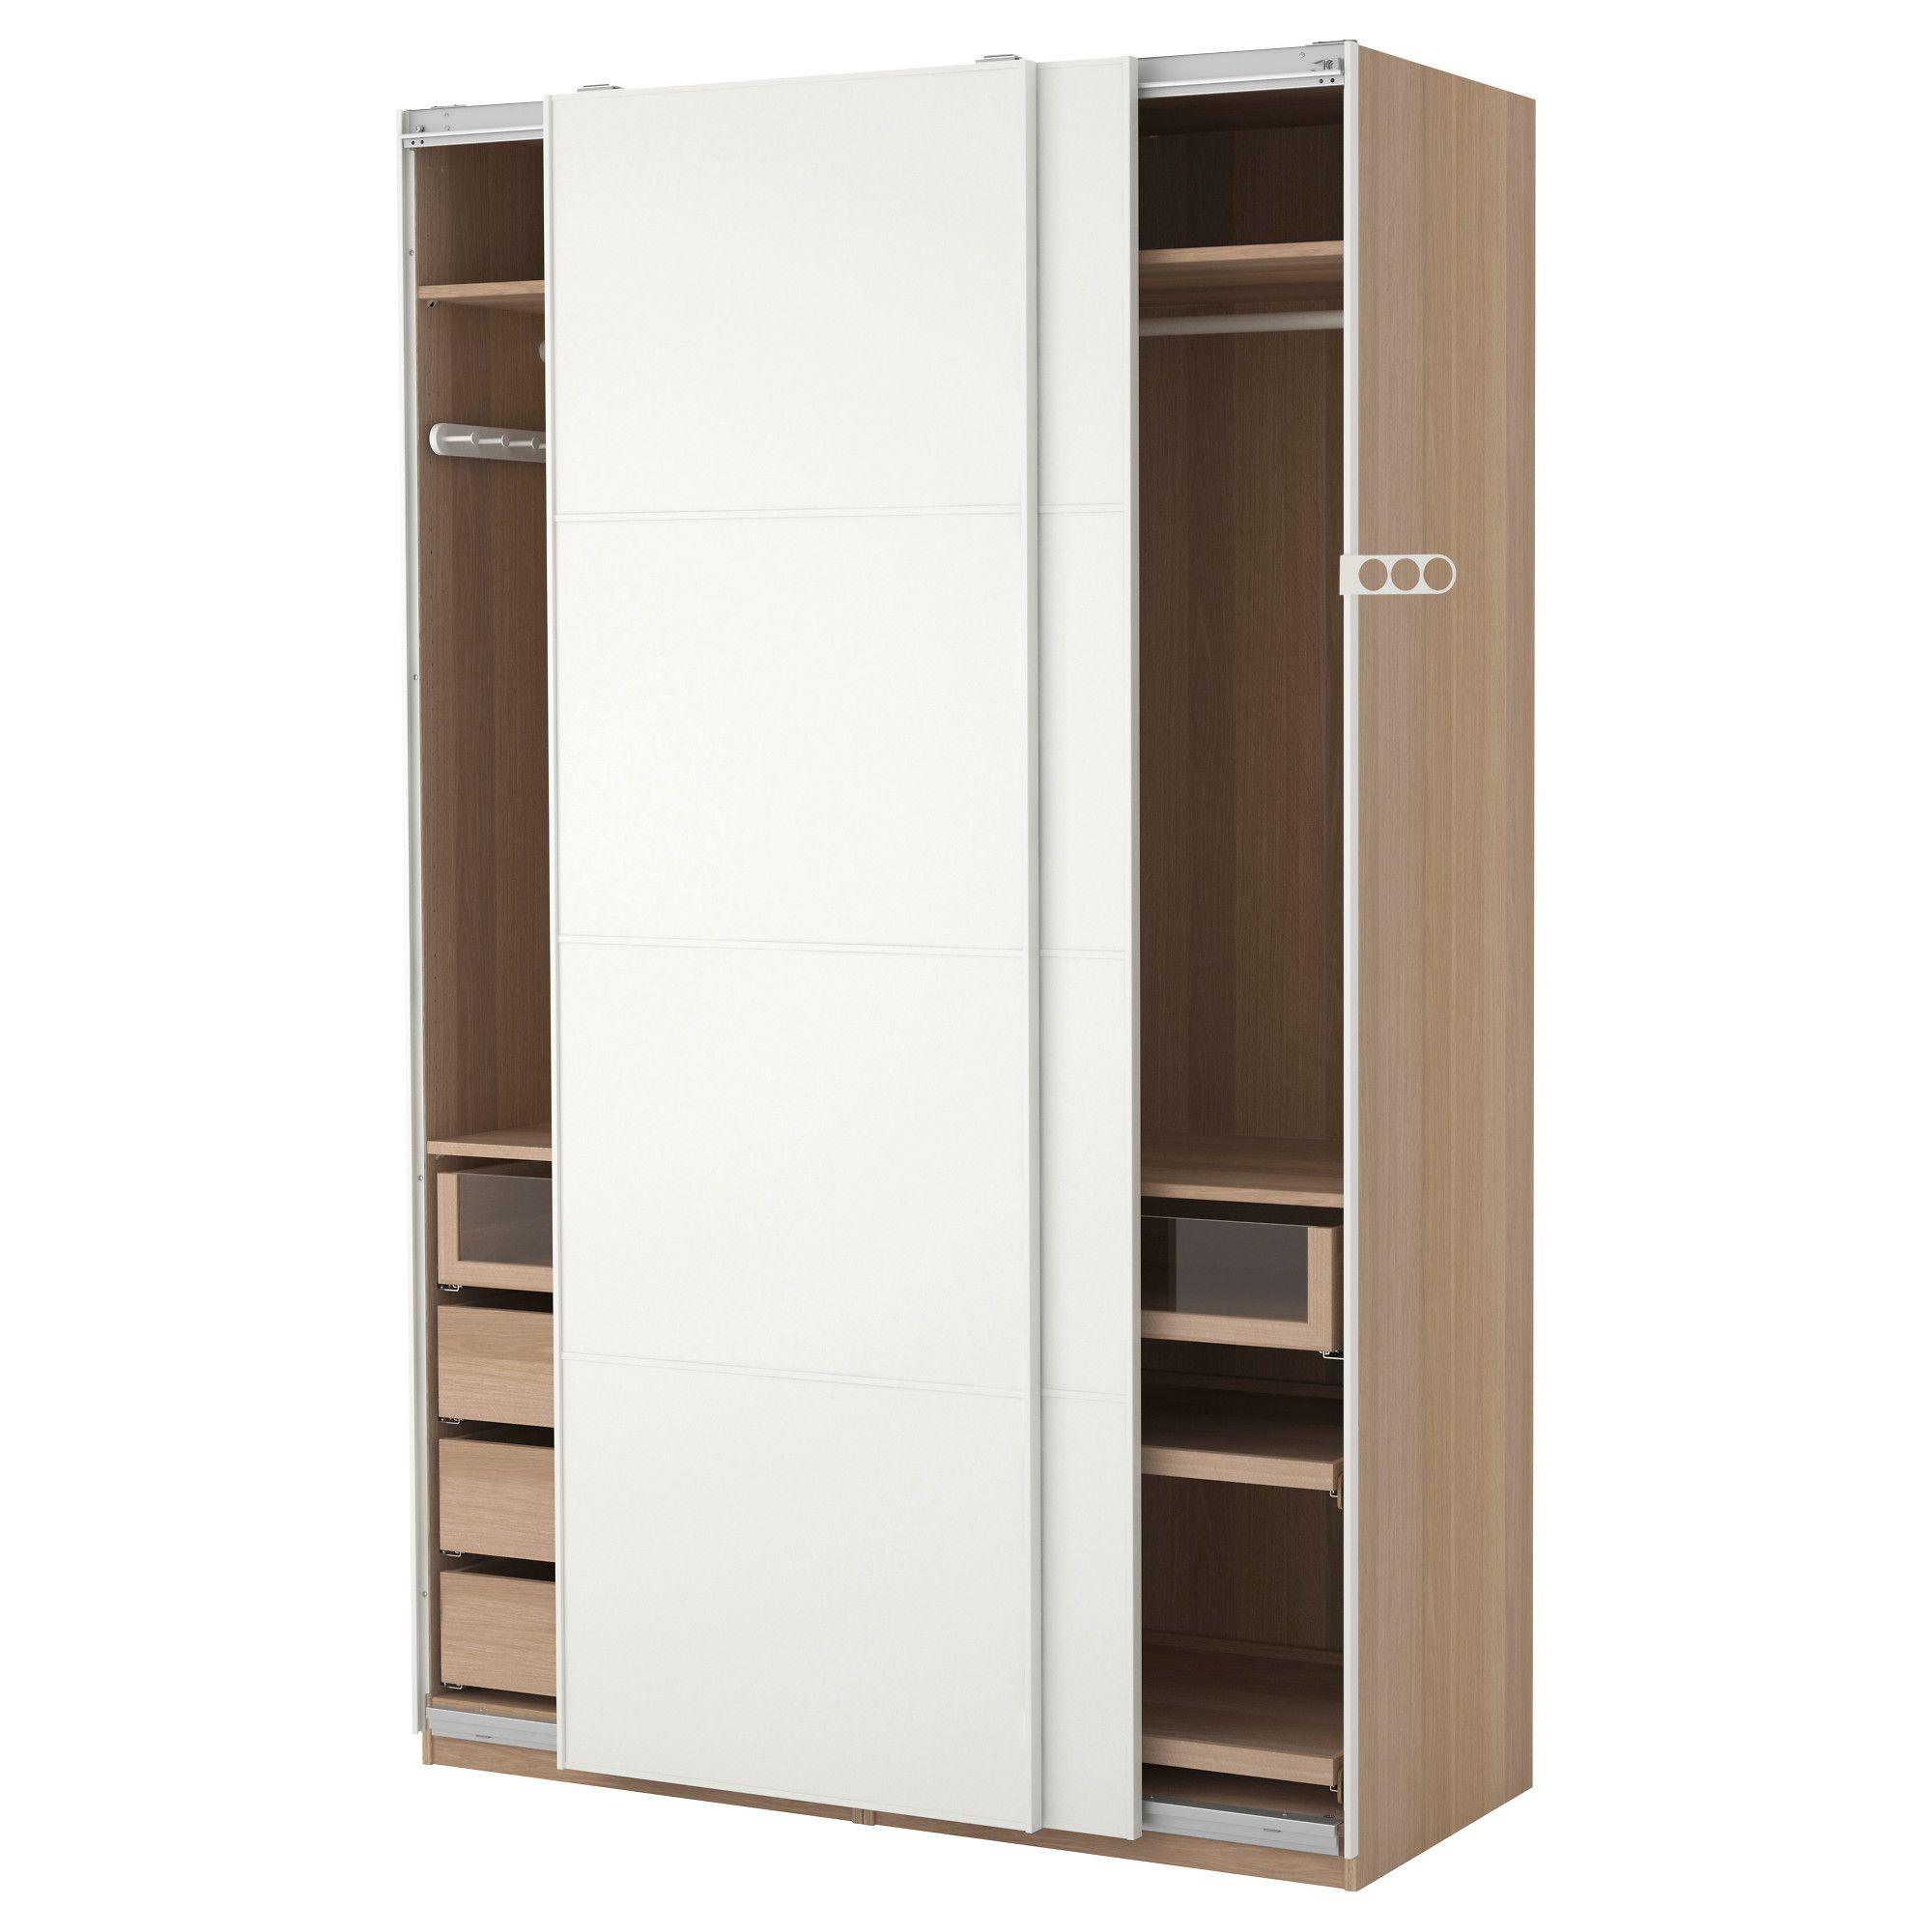 US Furniture and Home Furnishings Ikea pax wardrobe